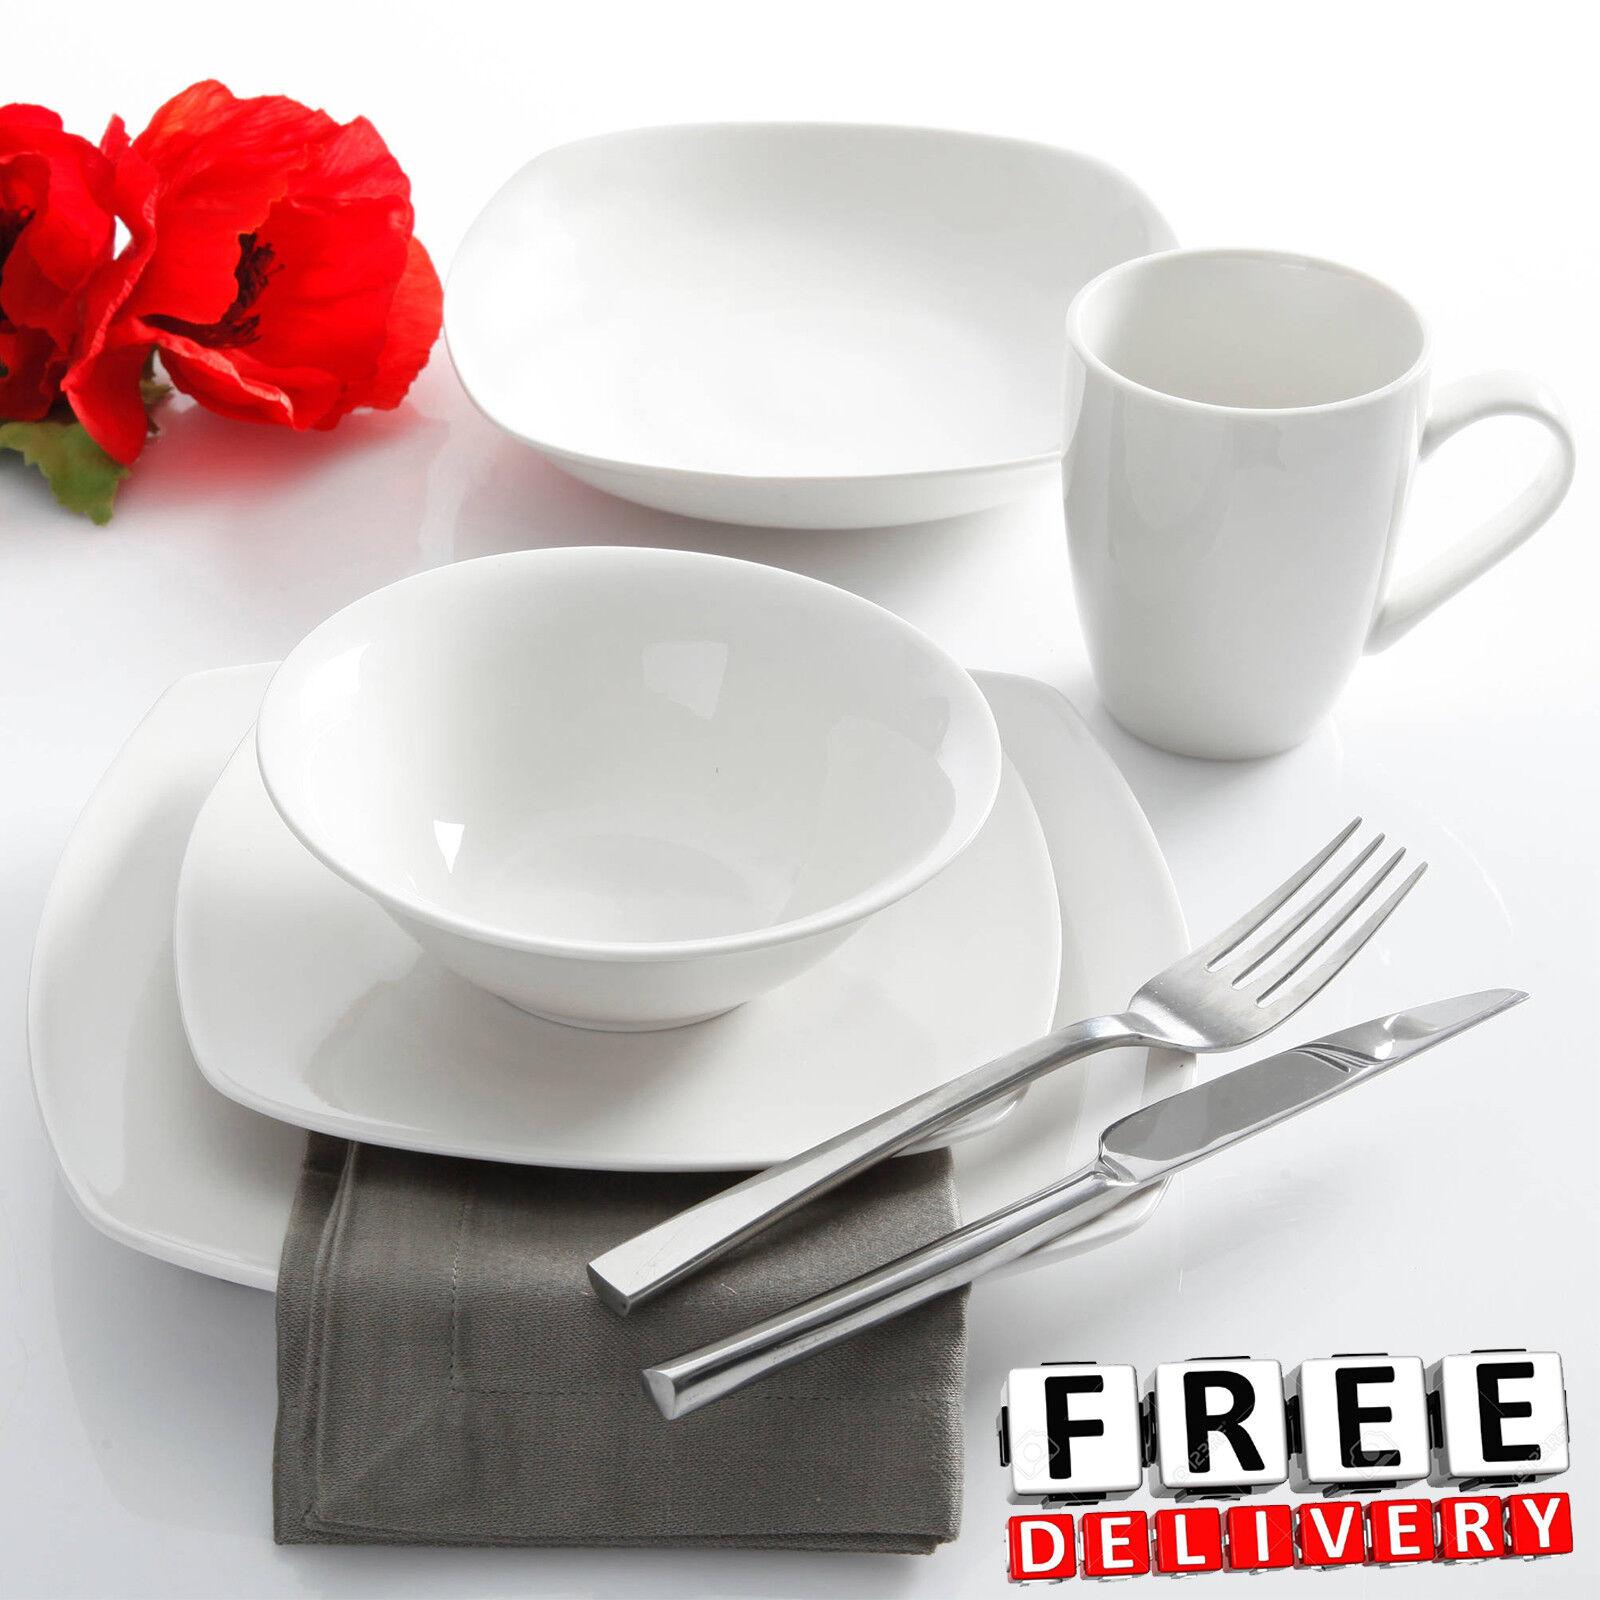 Porcelain Dinnerware Set For 6 30Pc White Round Kitchen Plat